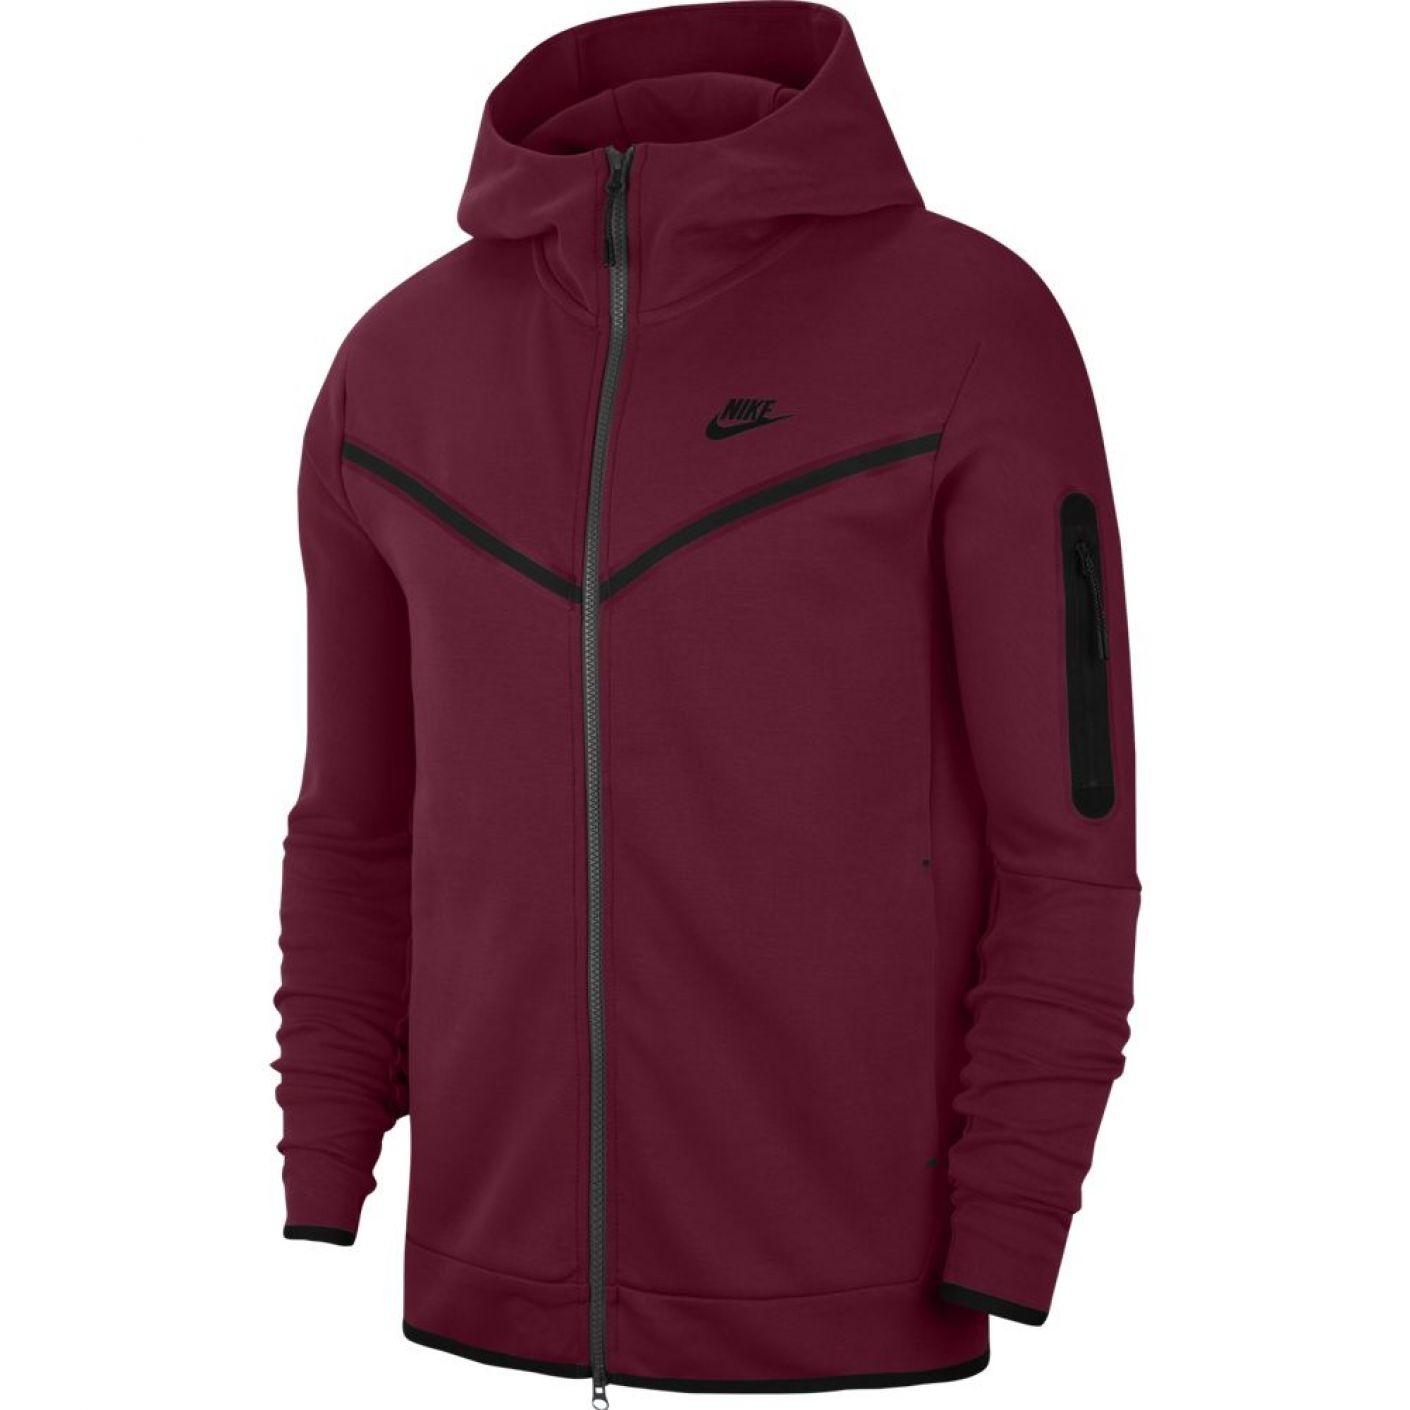 Nike Tech Fleece Windrunner Bordeaux Rood